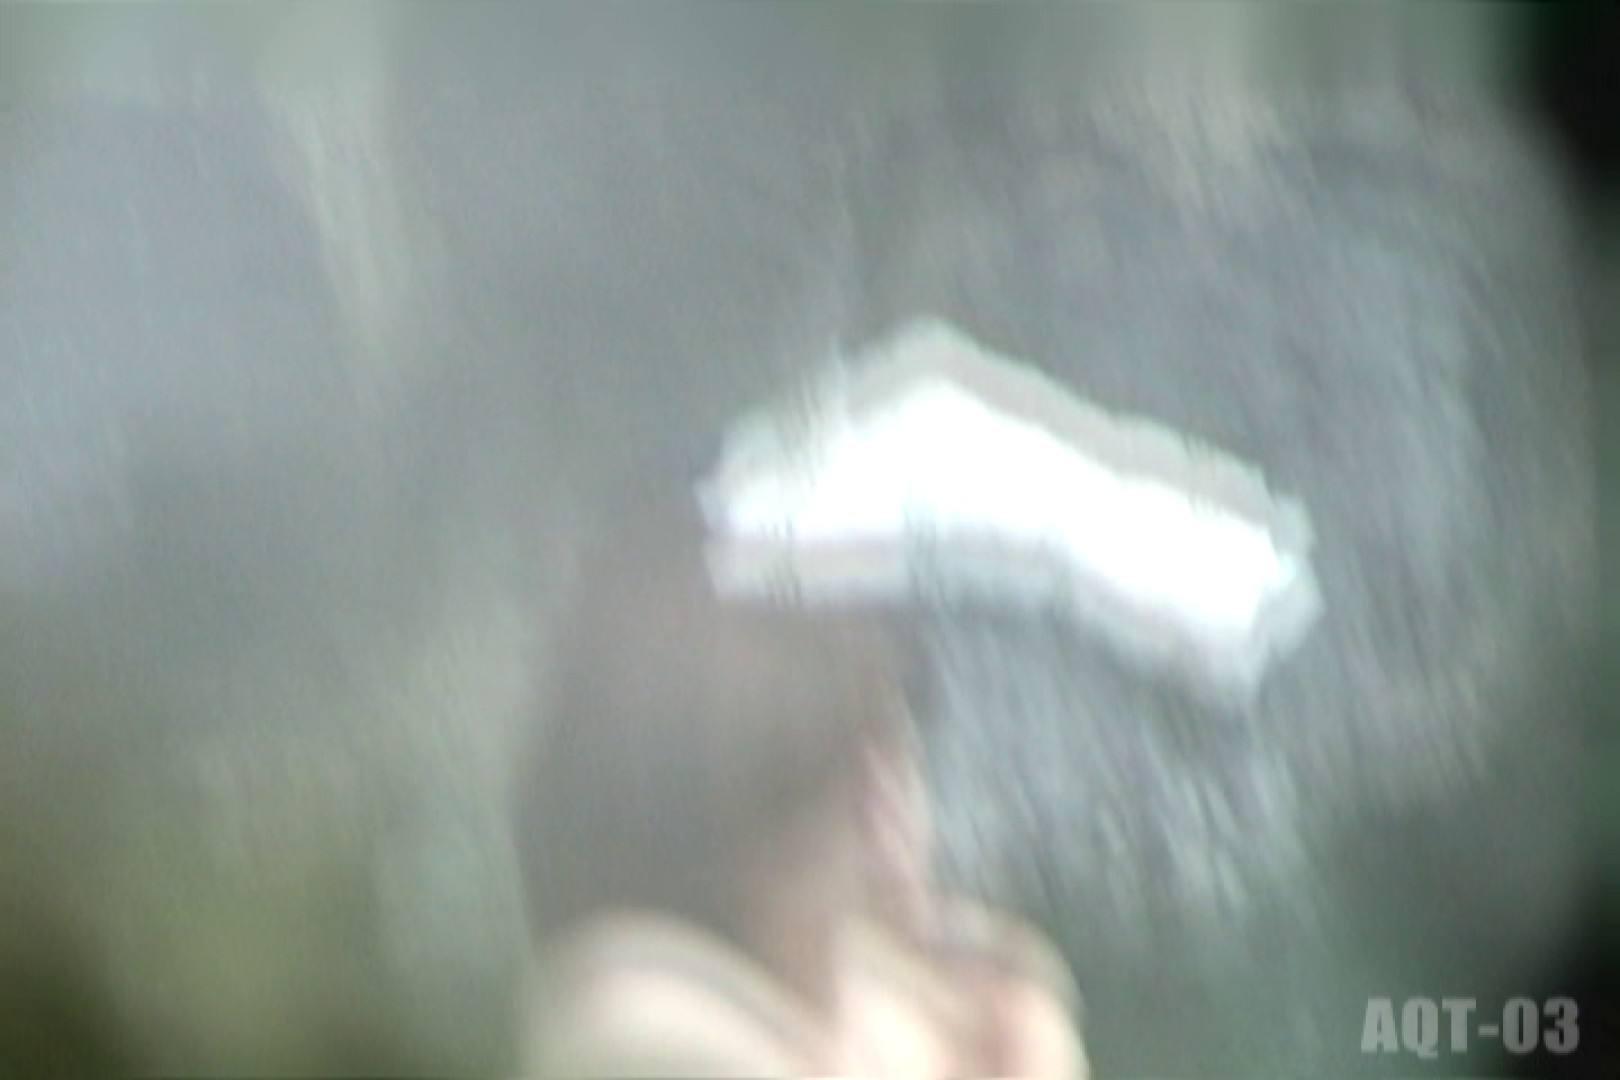 Aquaな露天風呂Vol.731 露天風呂突入 おめこ無修正動画無料 91pic 77